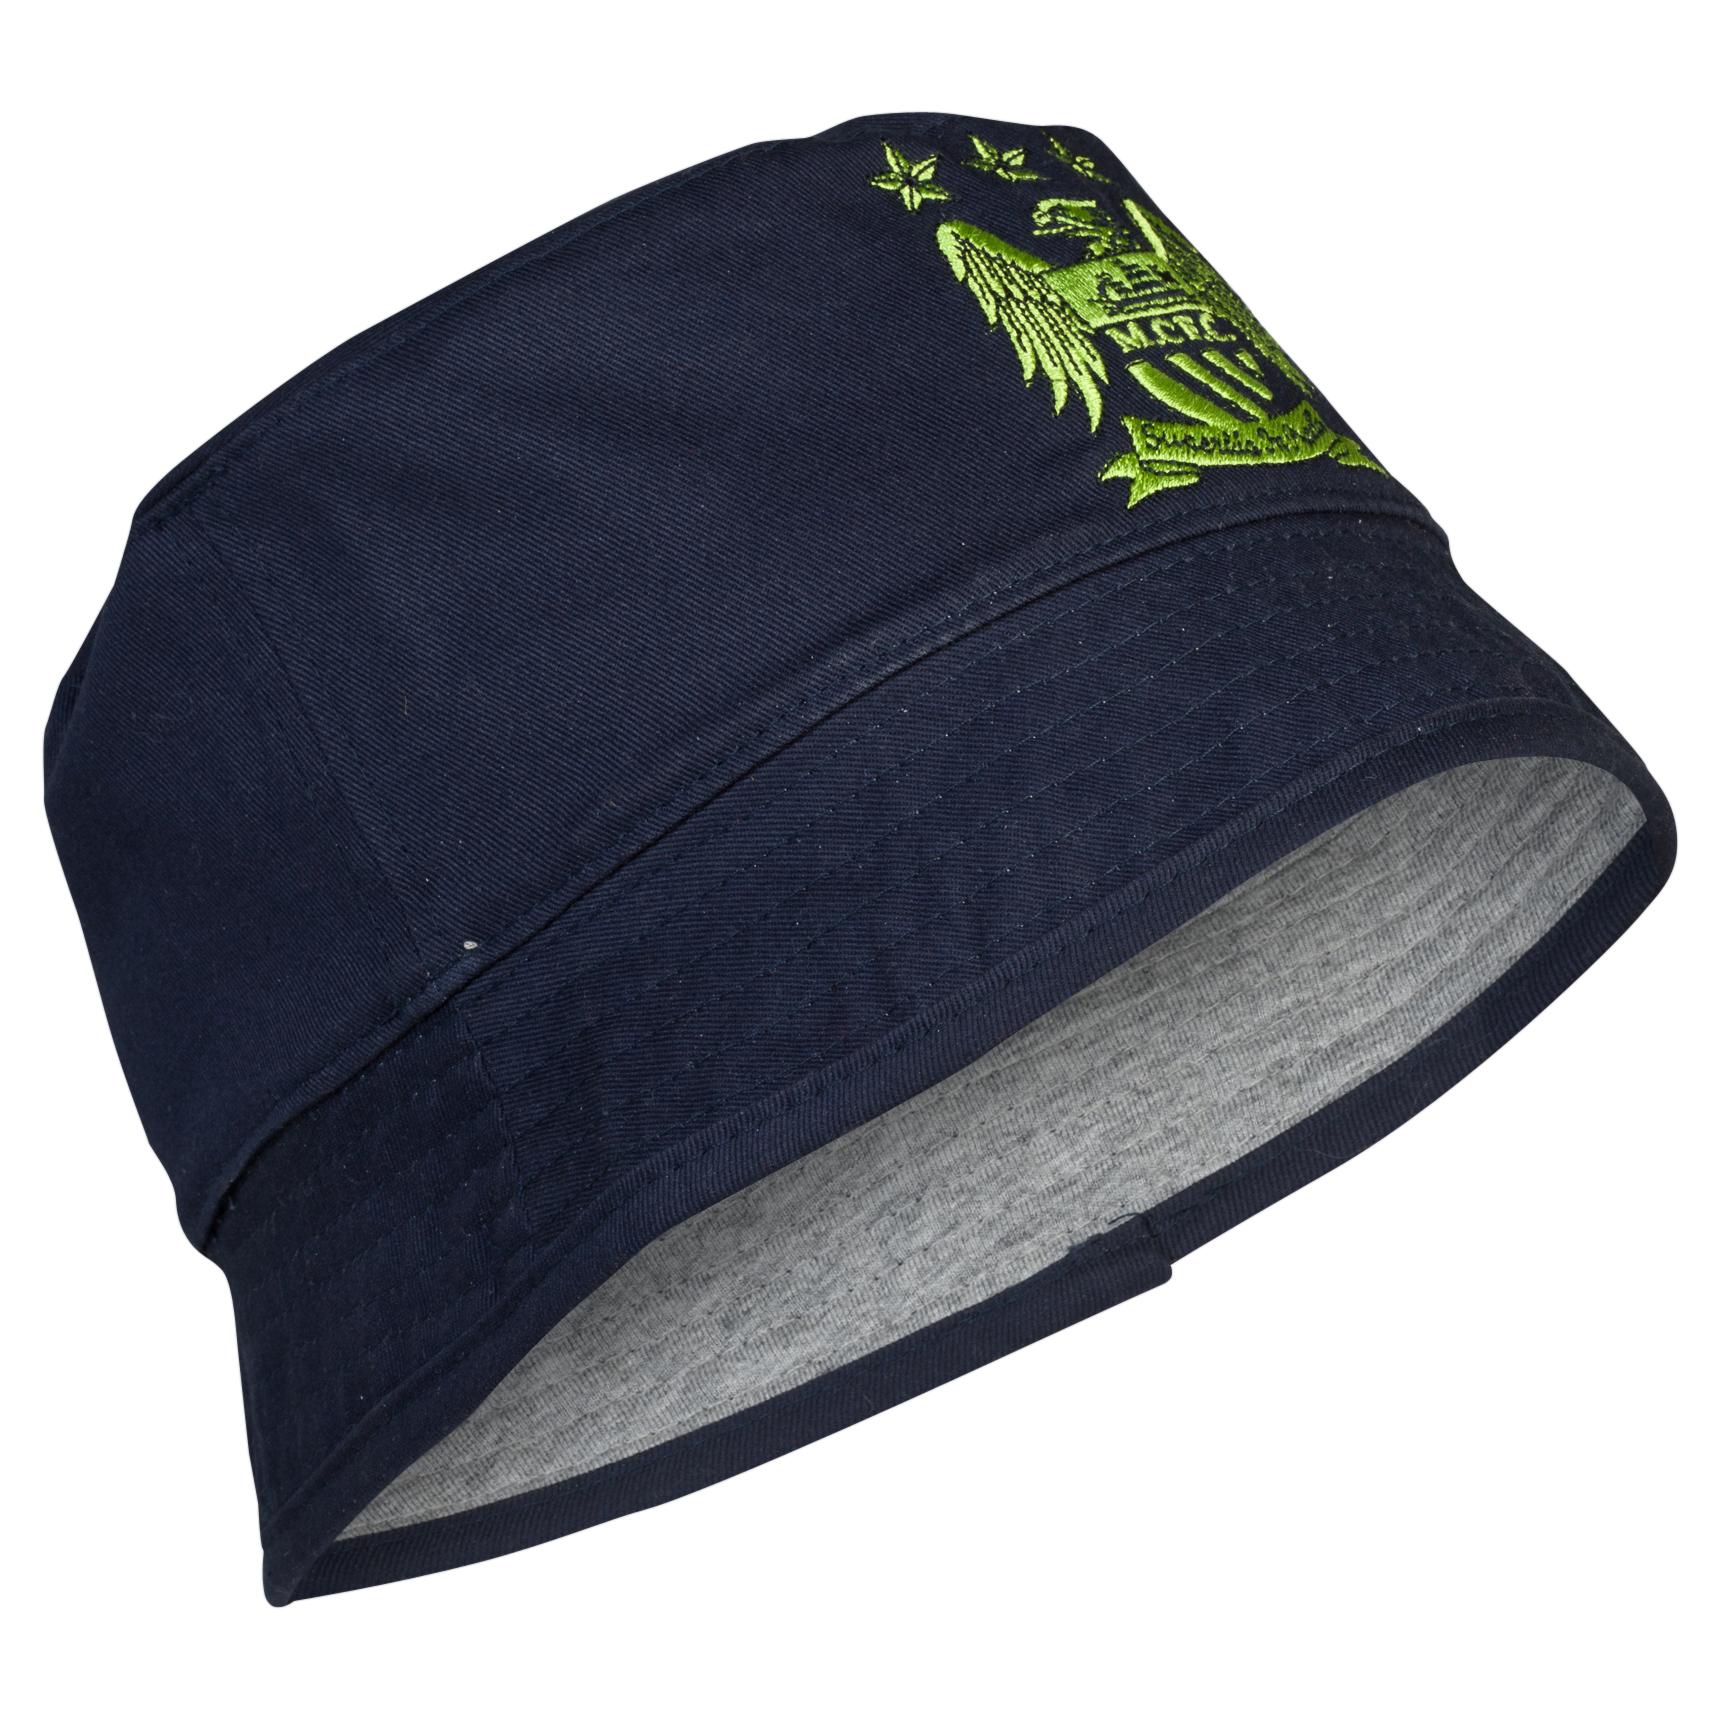 Manchester City Essential Shade Bucket Hat - Navy/Sky